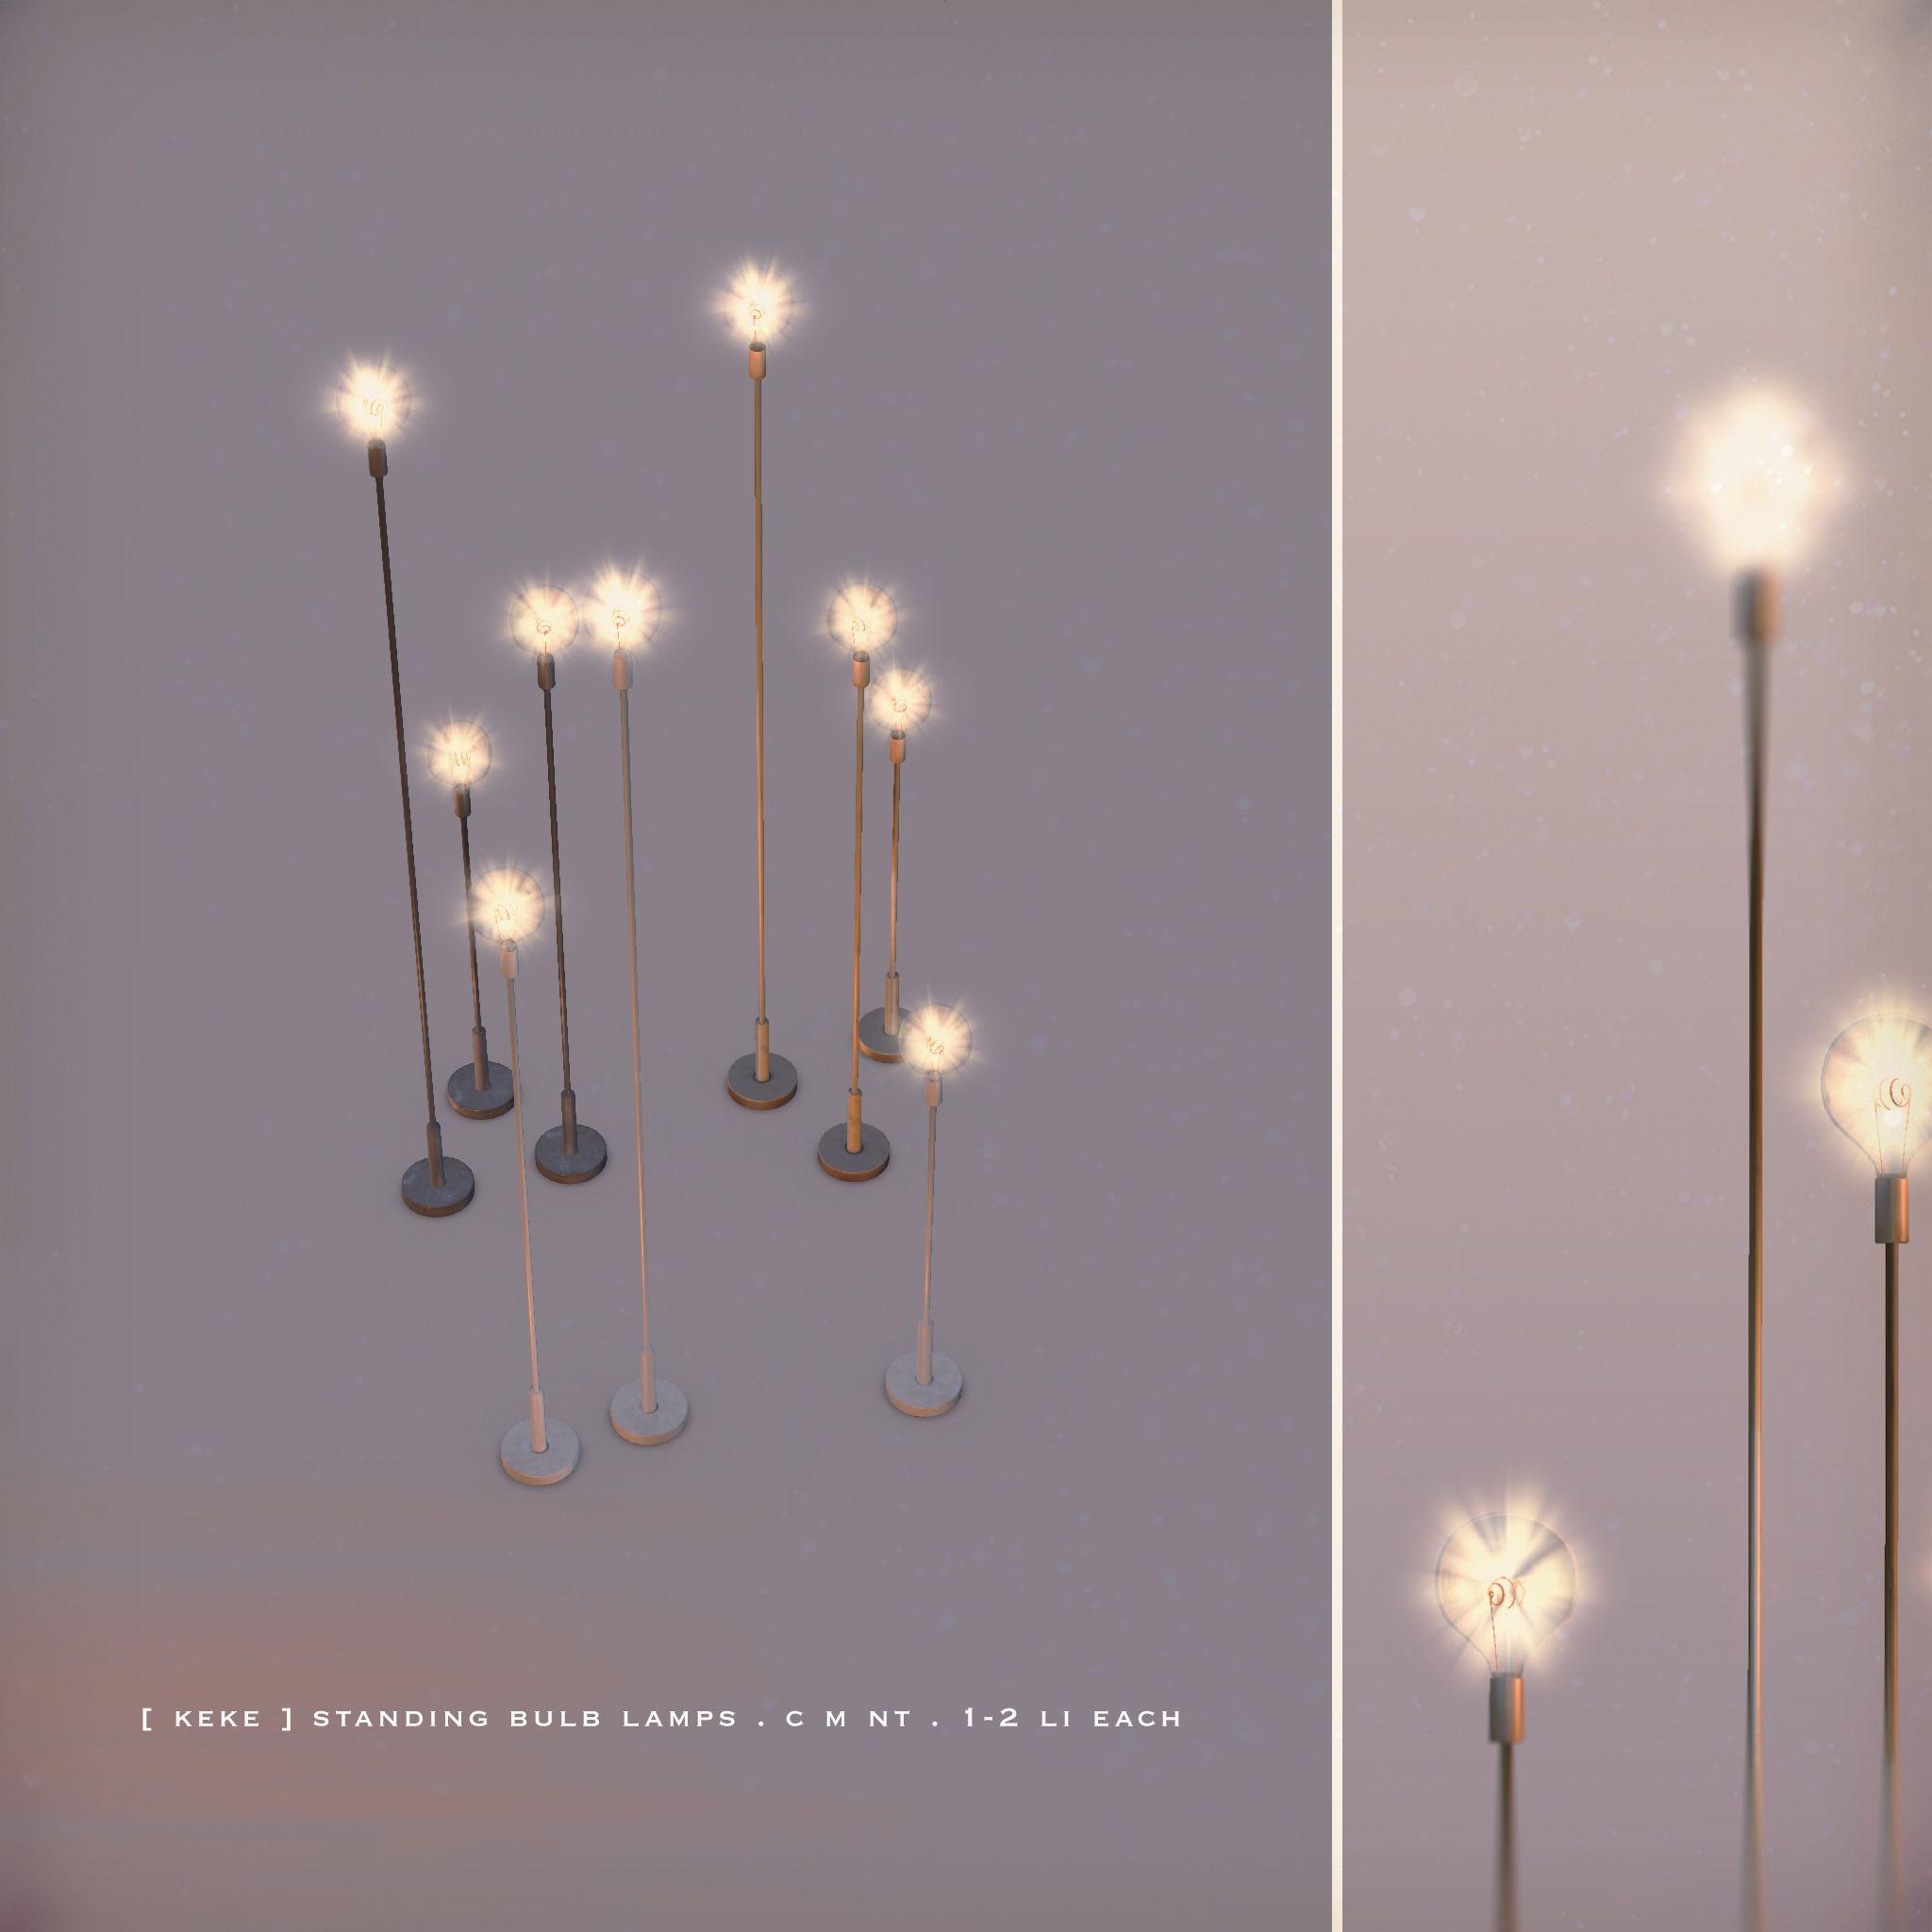 Keke Standing Bulb Lamps Sims 4 Cc Furniture Sims 4 Houses Sims 4 Bedroom